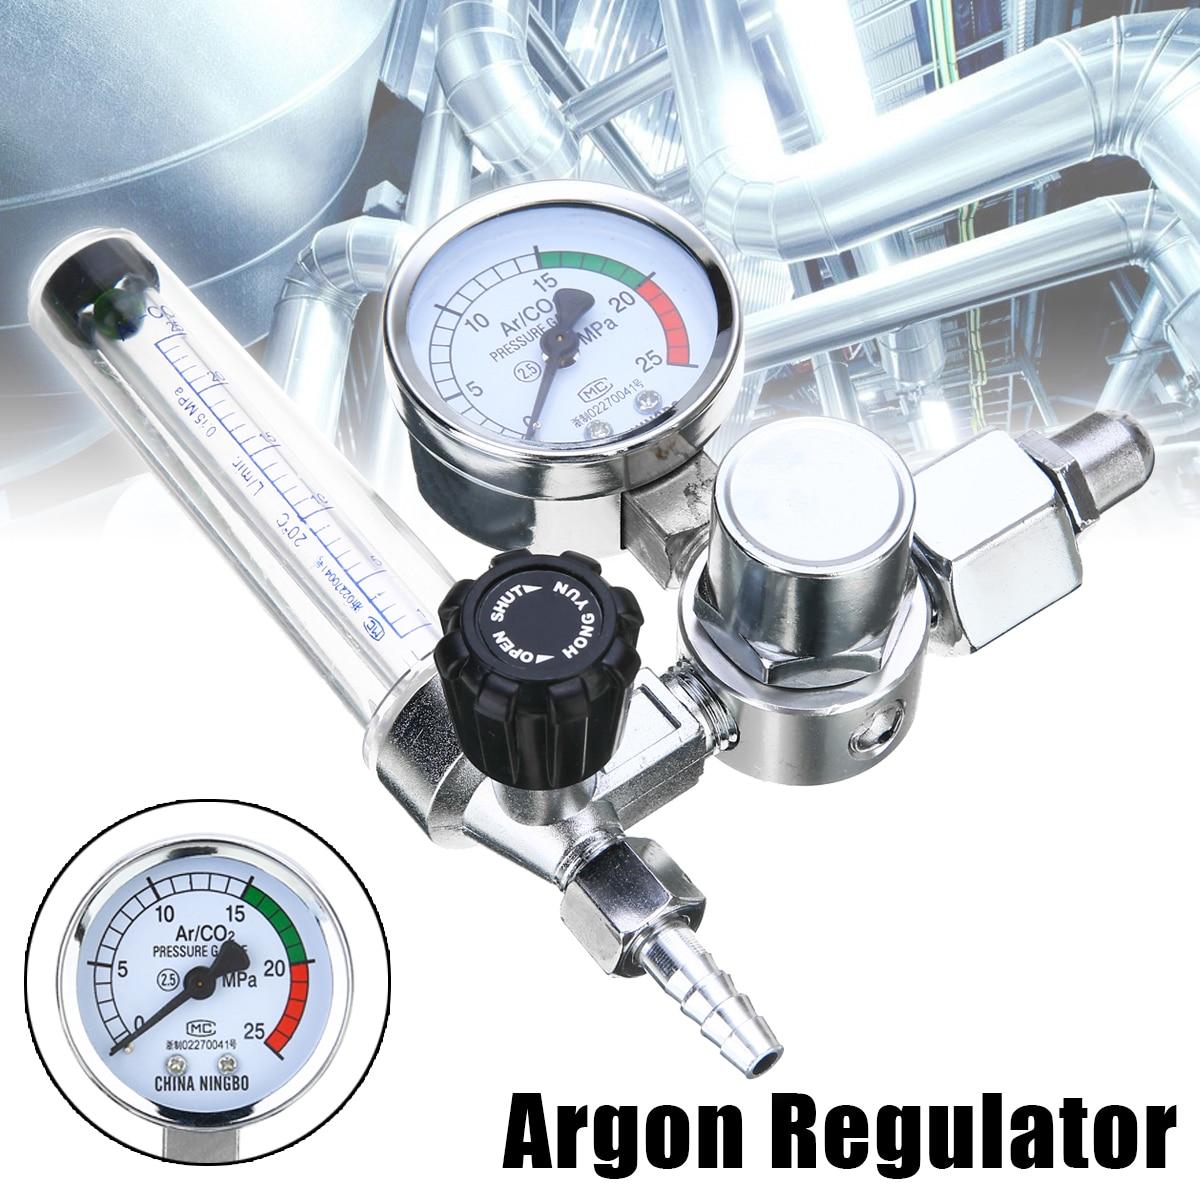 0-25Mpa Argon Regulator CO2 Mig Tig Flow Meter Gas Regulator Flowmeter Welding Weld Gauge Argon Regulator Pressure Reducer